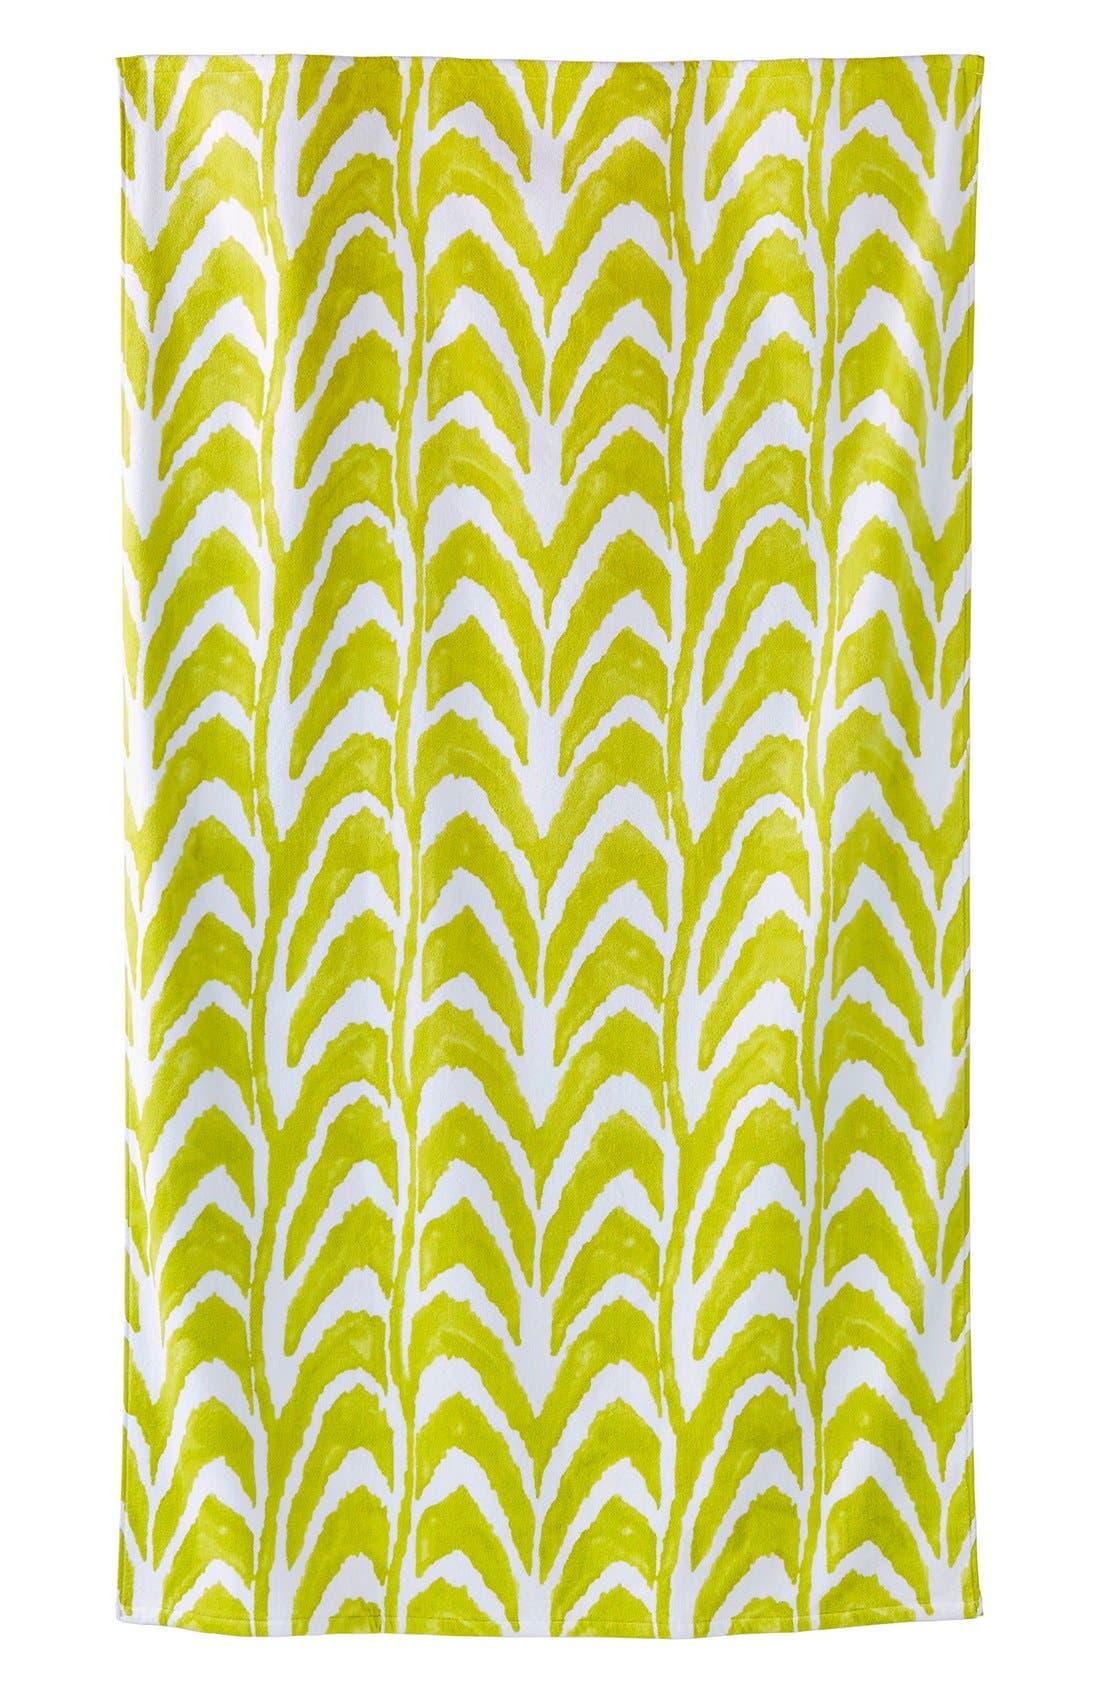 'Imrita' Wave Pattern Beach Towel,                             Main thumbnail 1, color,                             300